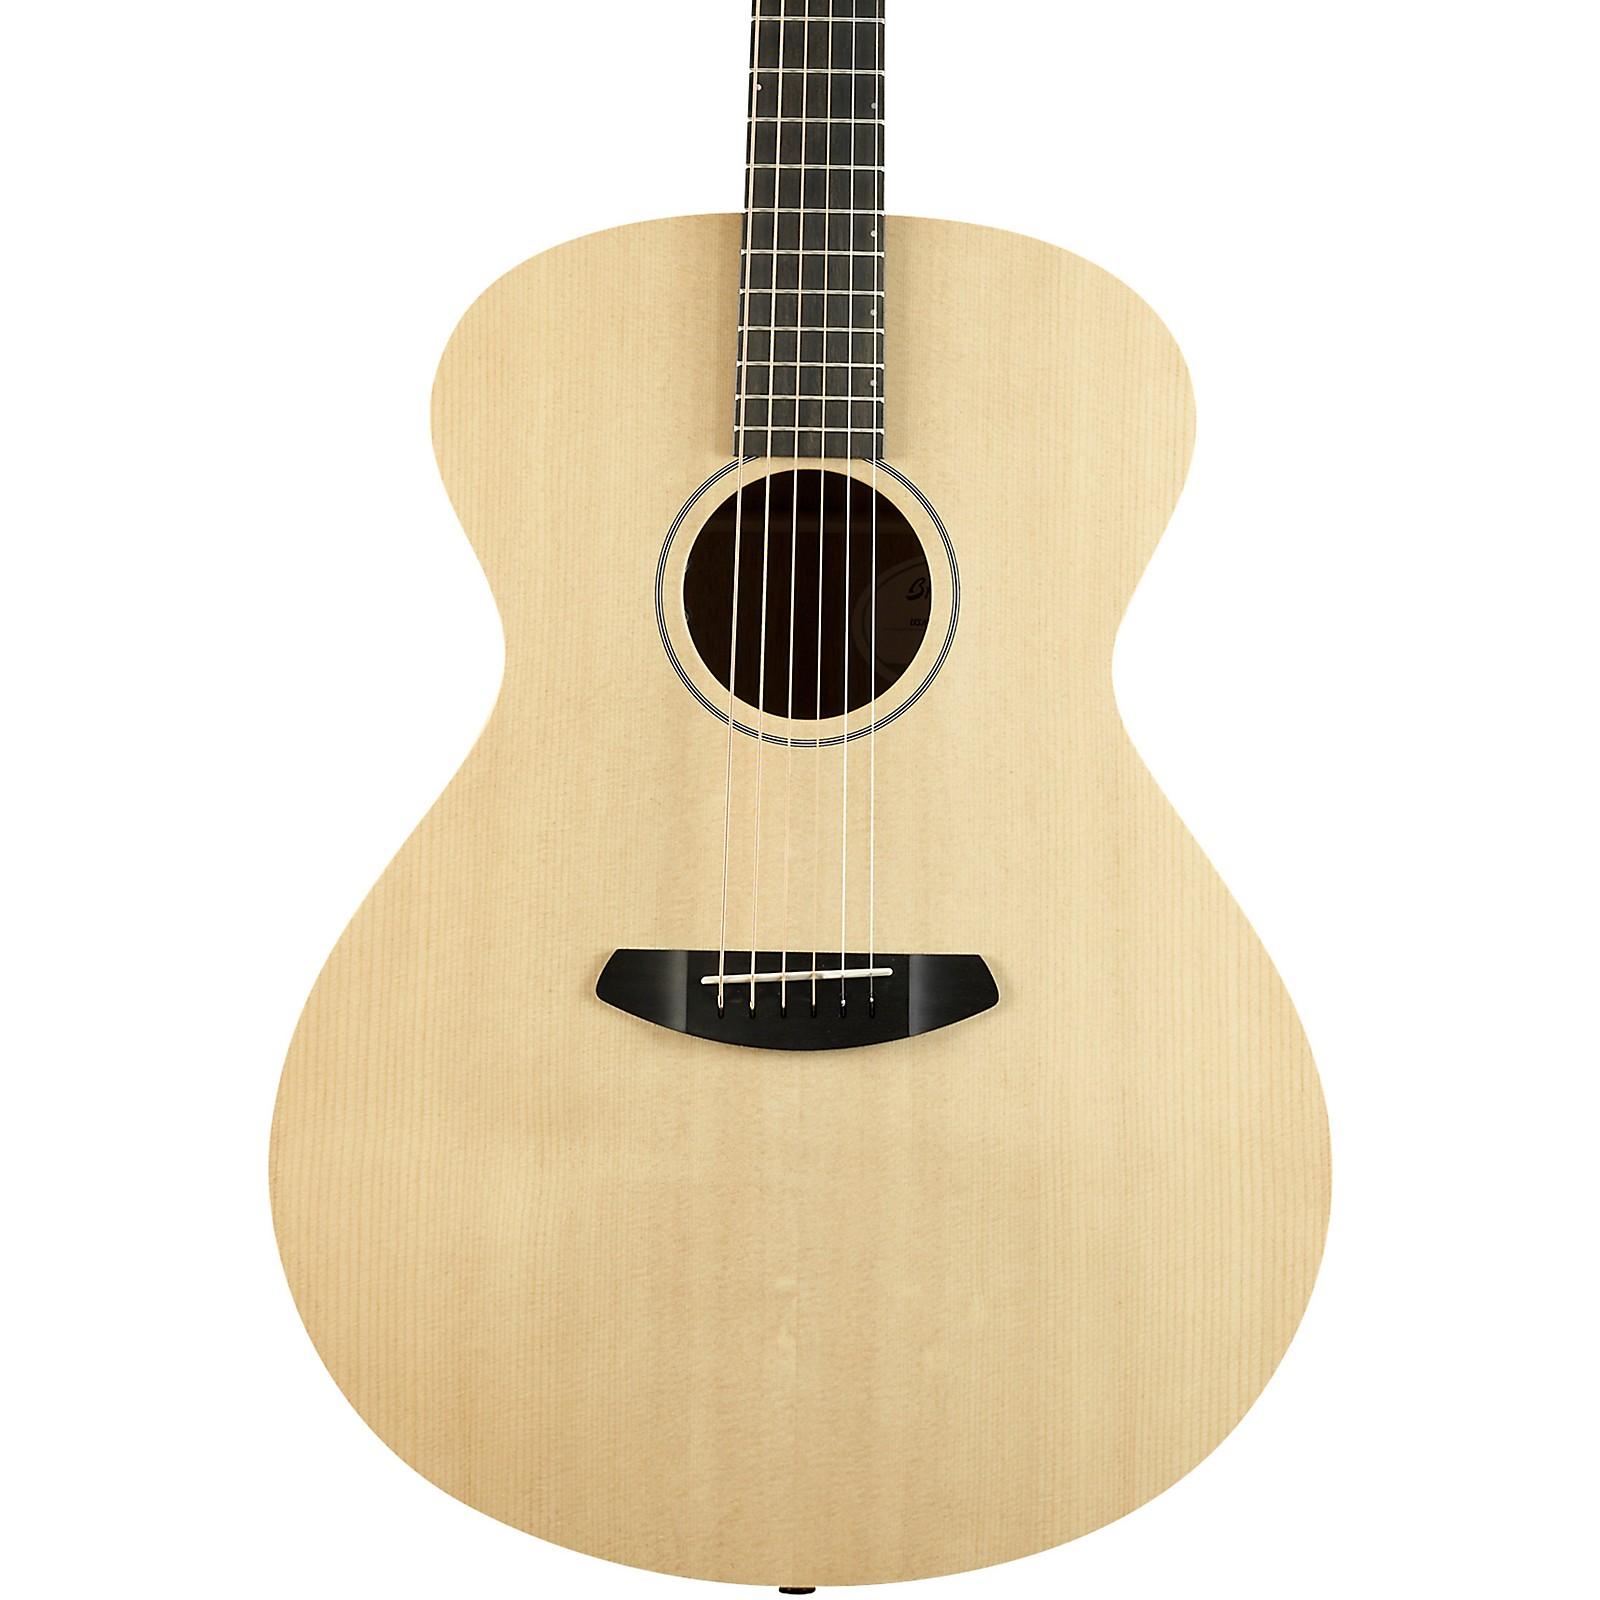 Open Box Breedlove USA Concerto Day Light E Sitka Spruce - Mahogany Acoustic-Electric Guitar